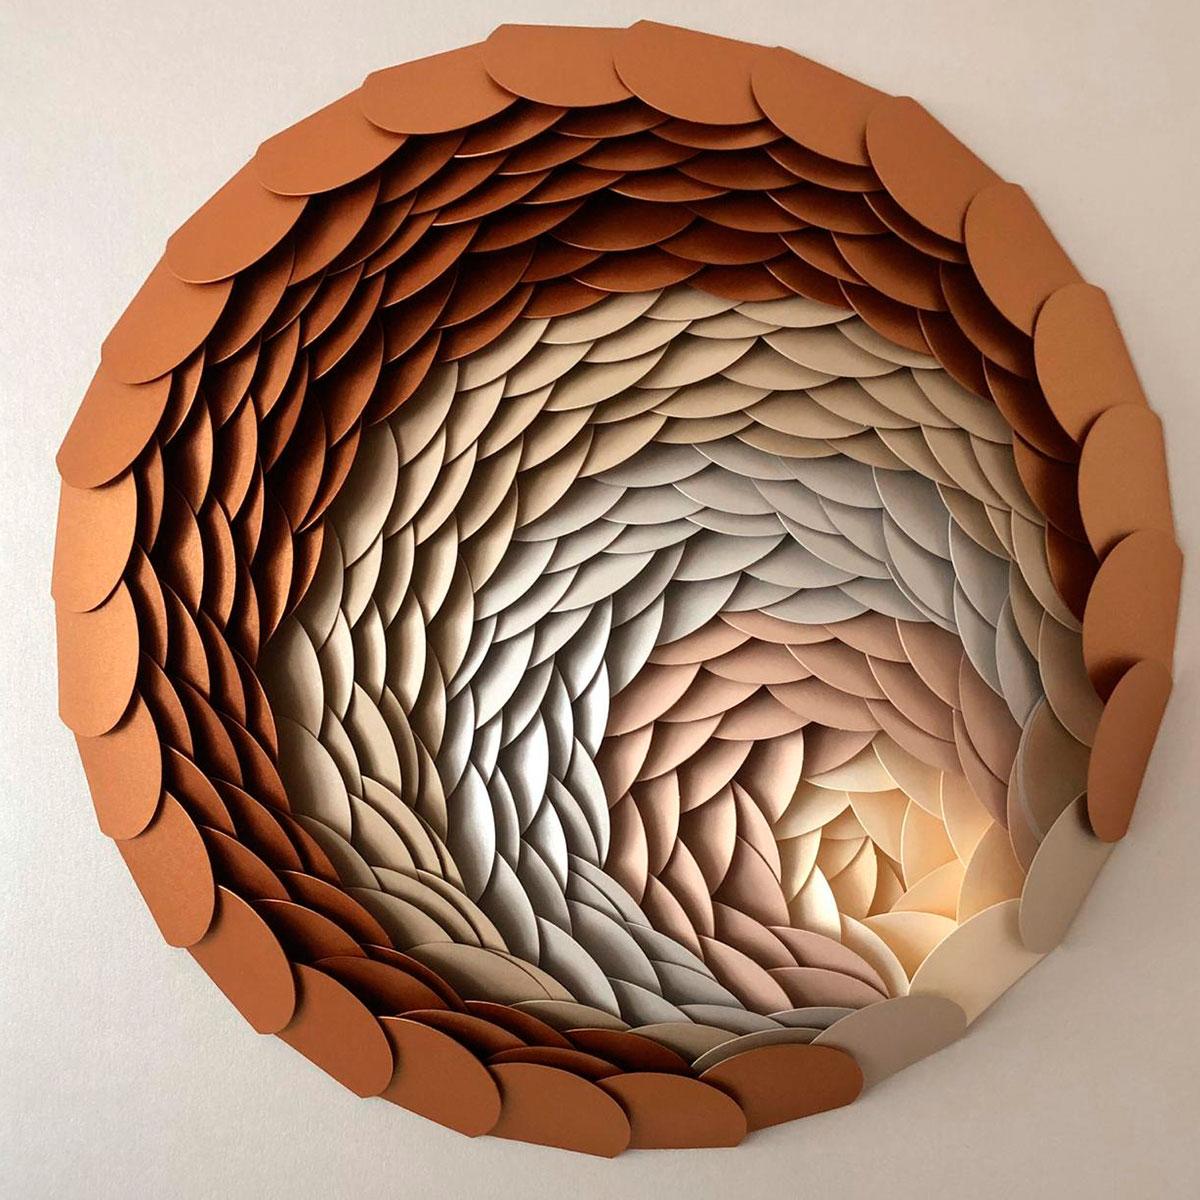 Circle of life (Nidos)